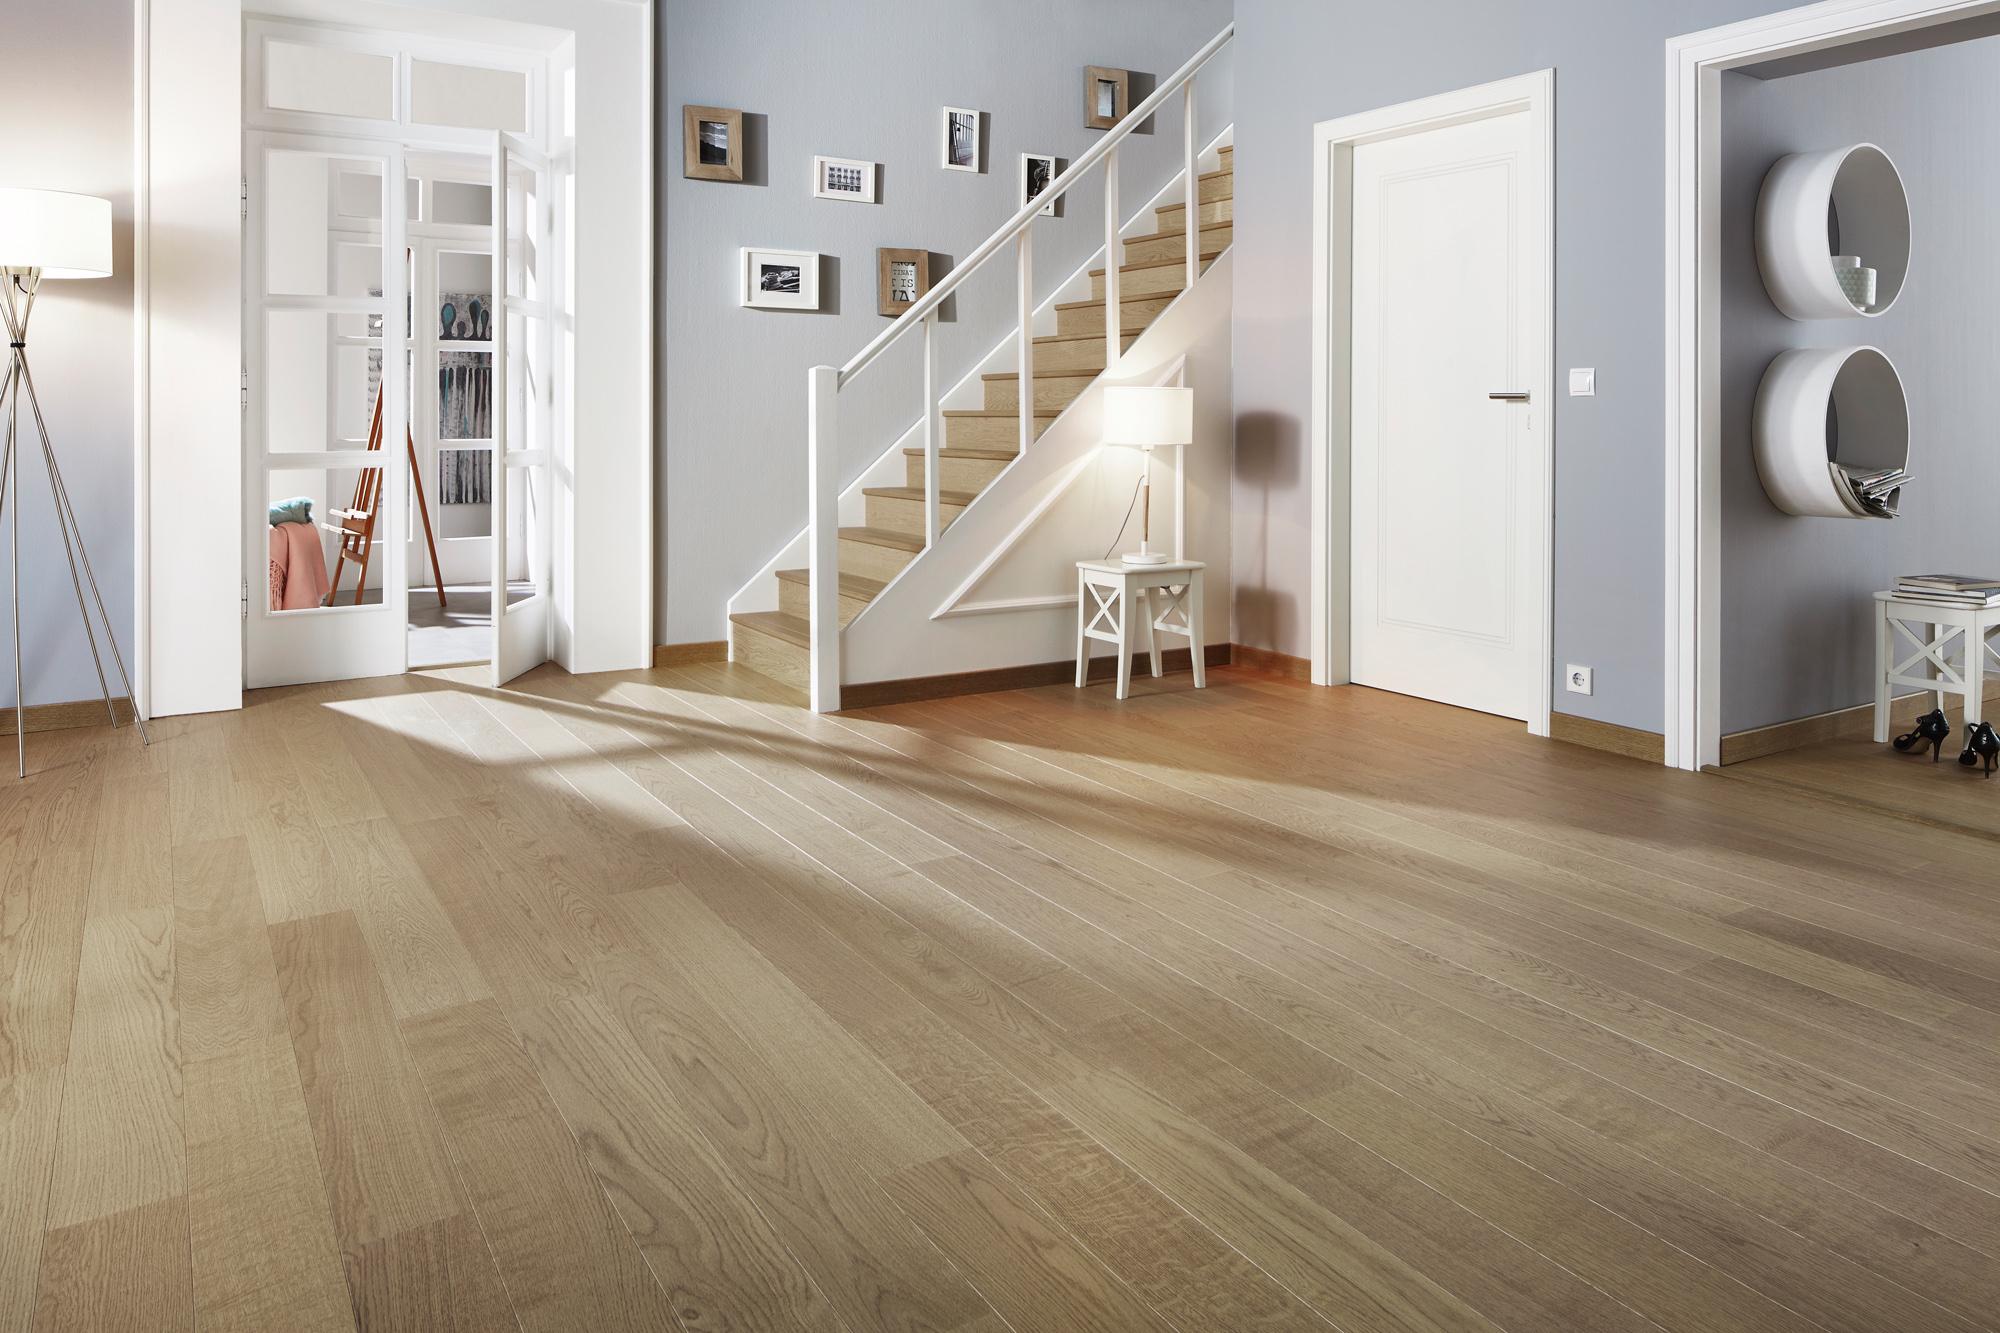 parquet chevron prix cheap carelage imitation parquet avec prix carrelage imitation et. Black Bedroom Furniture Sets. Home Design Ideas